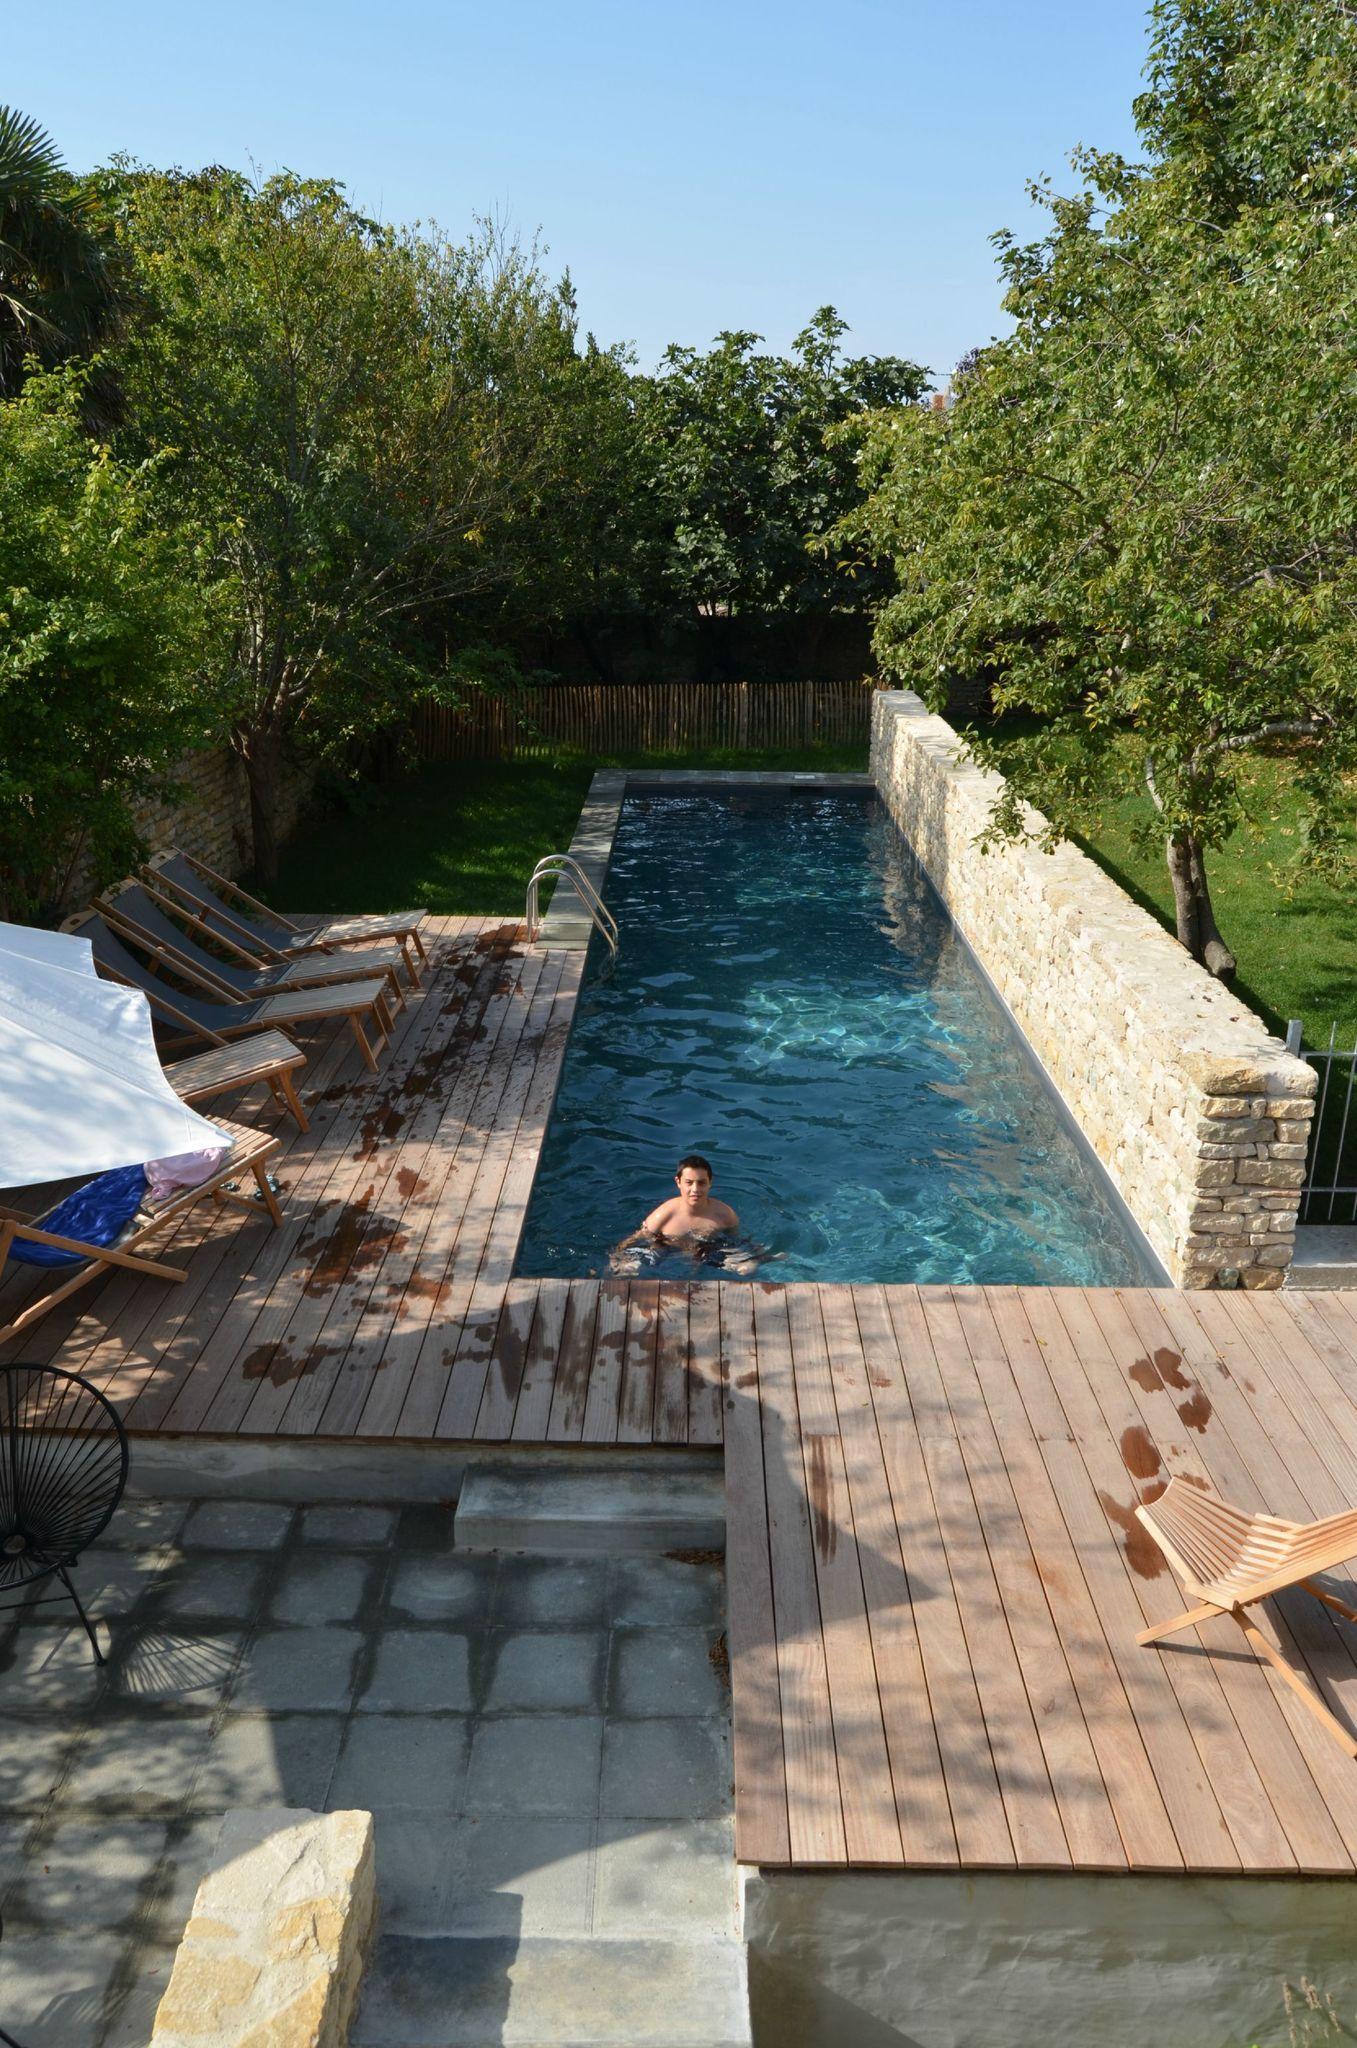 R Spi R Lin Et Lavande Screened Hot Tub Pinterest Swimming Pools Pool Designs And